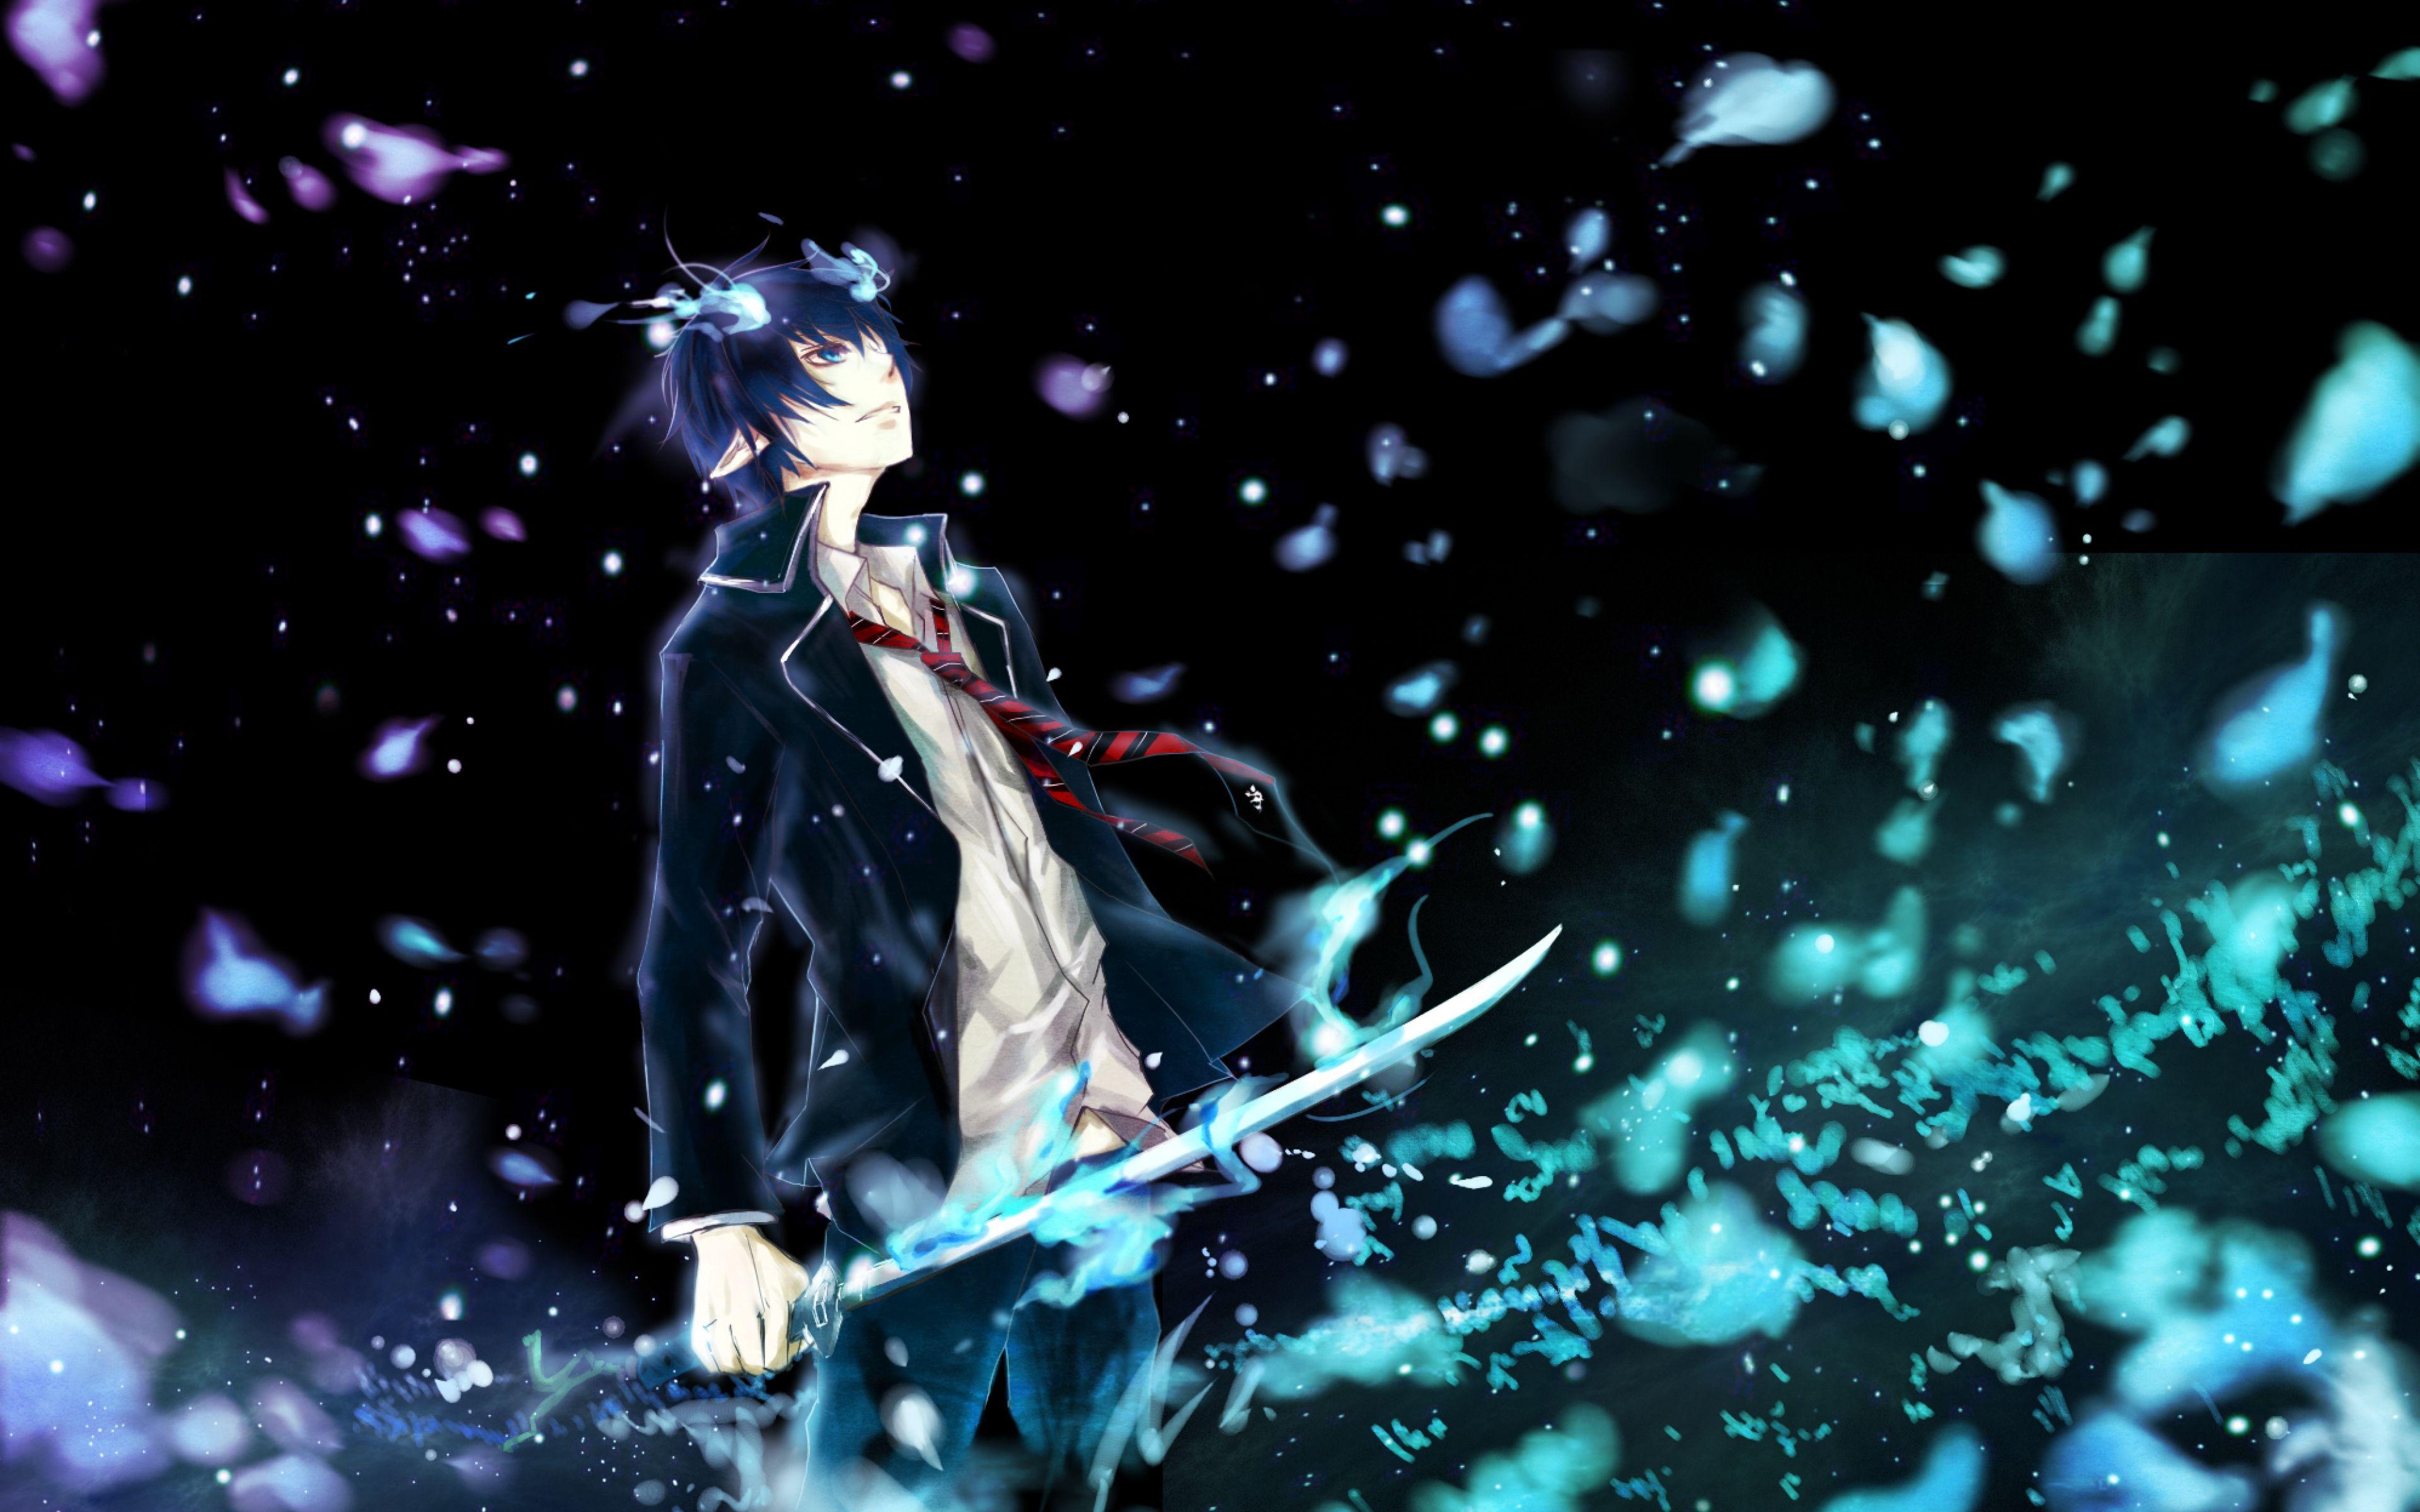 Anime Blue Exorcist Rin Okumura Ao No Exorcist Kurikara Wallpaper